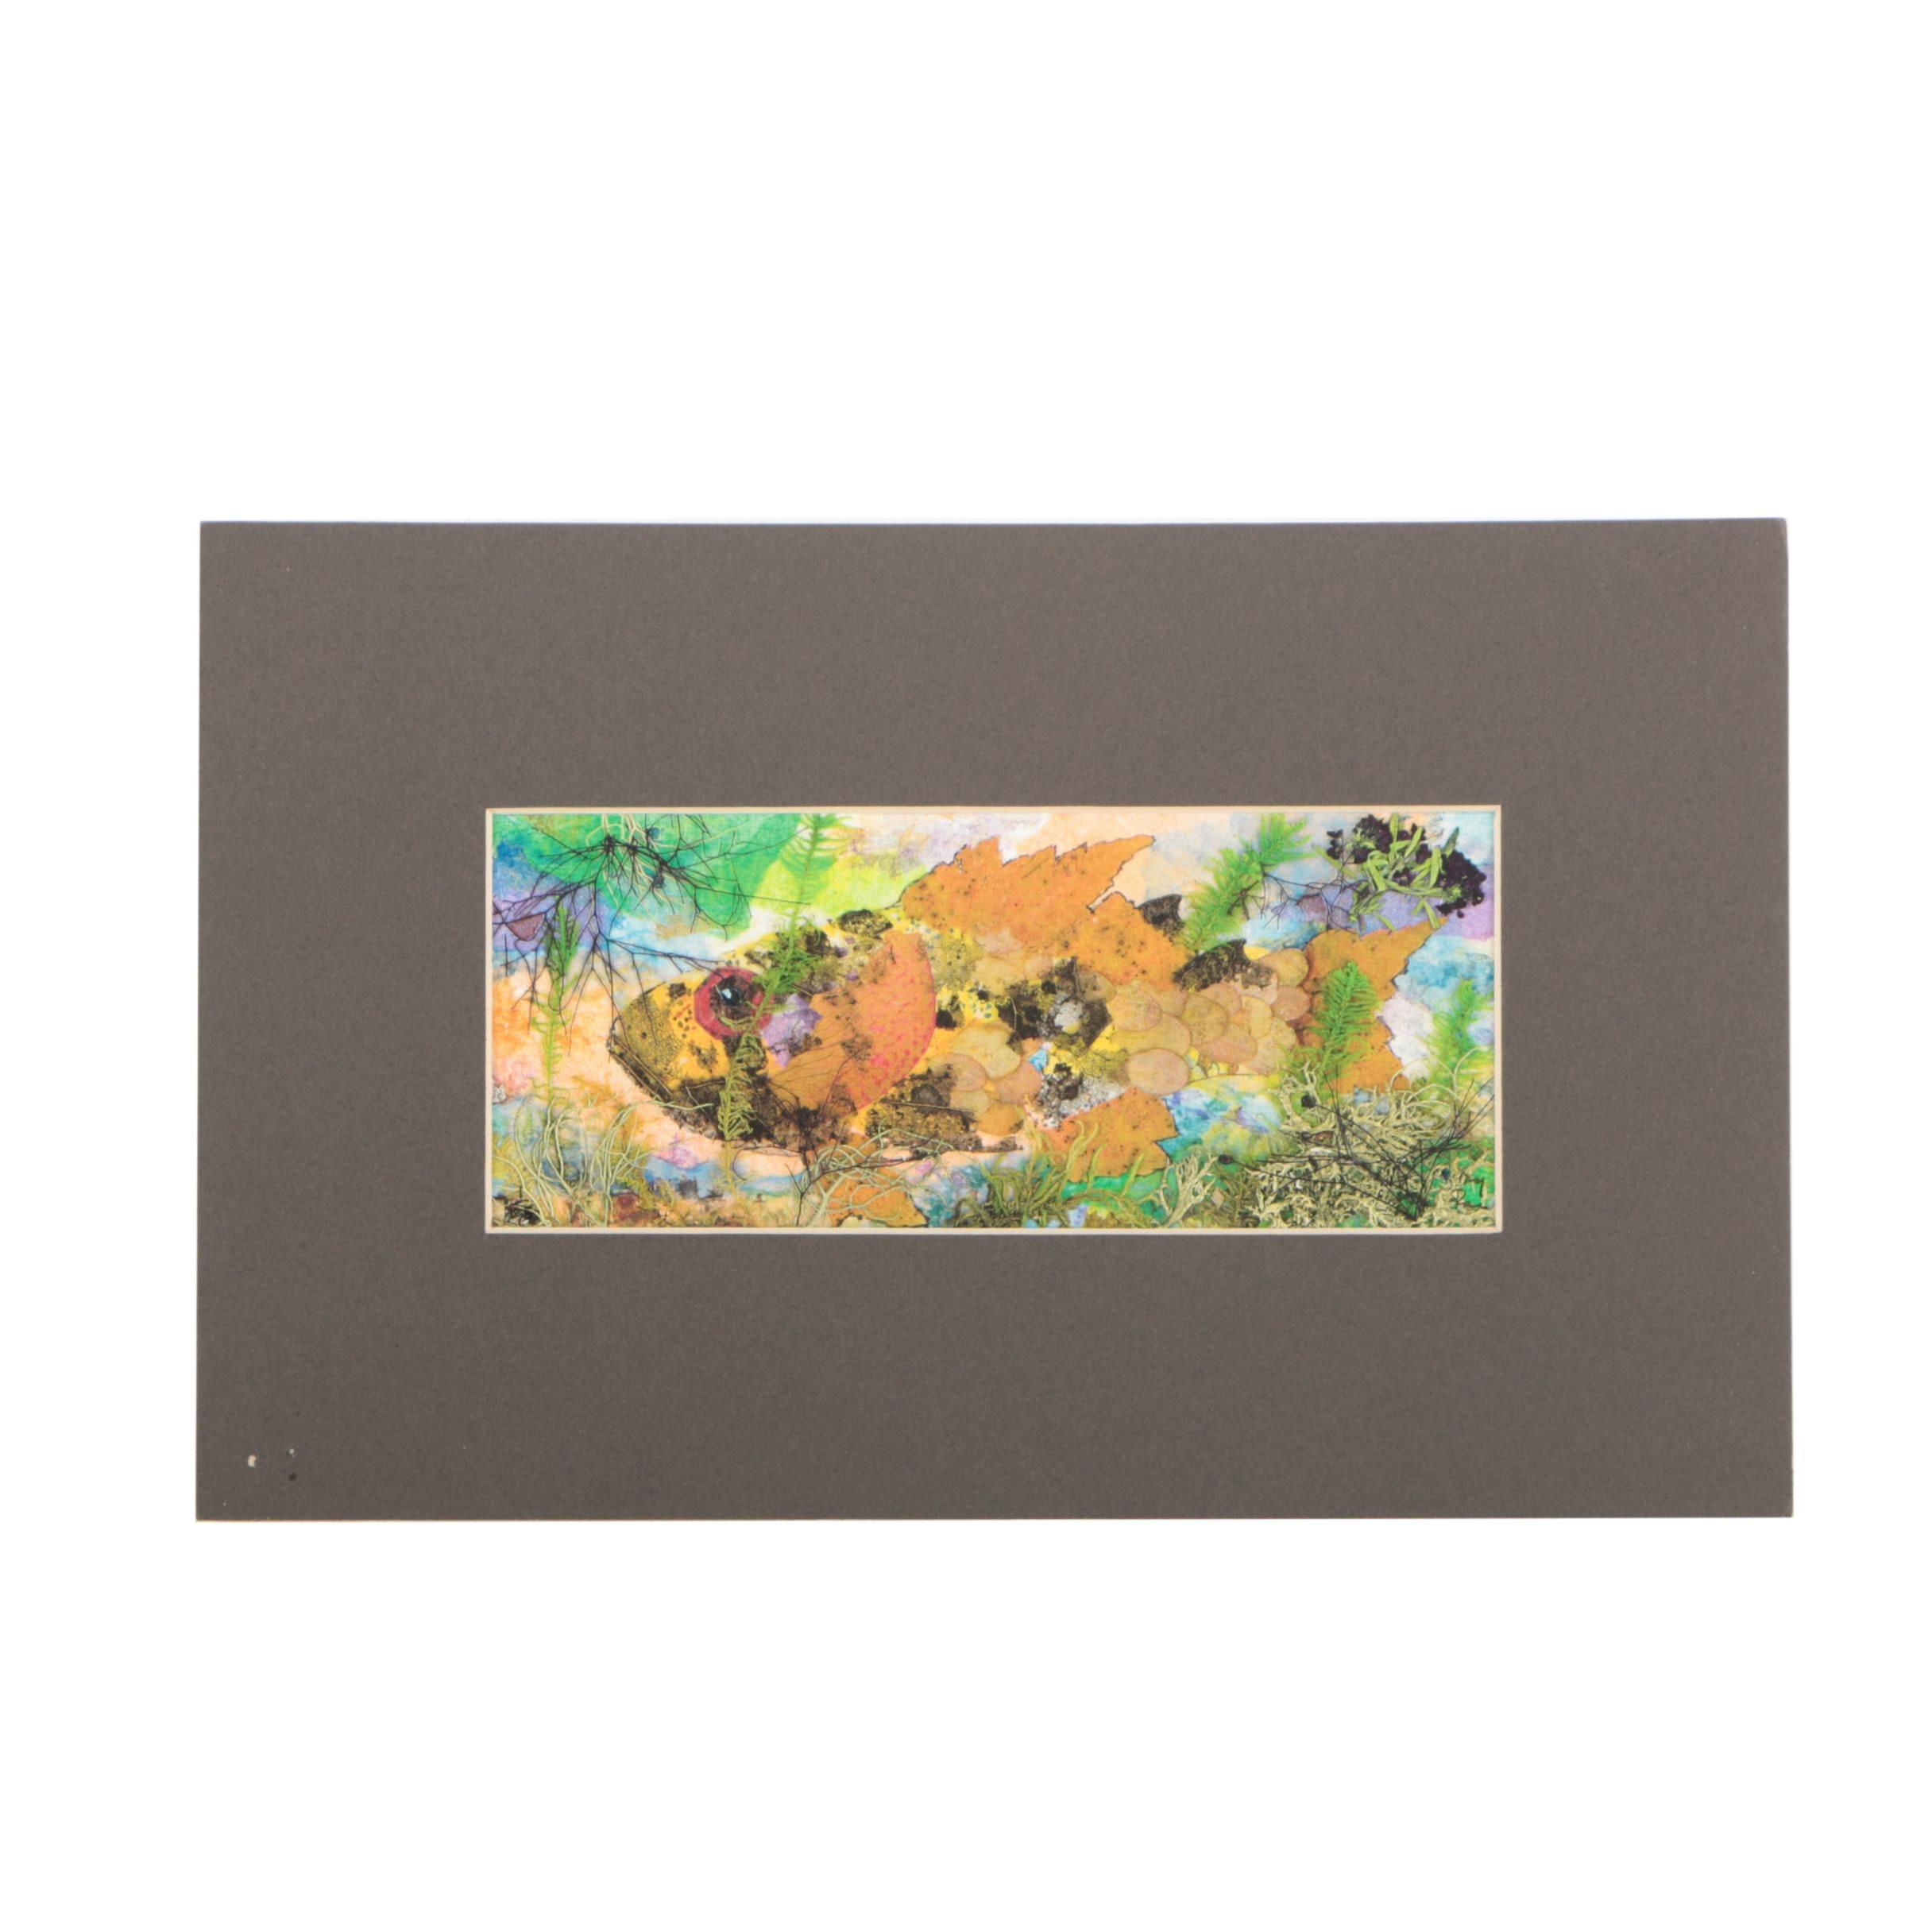 Giclee Print of Fish and Island Plants